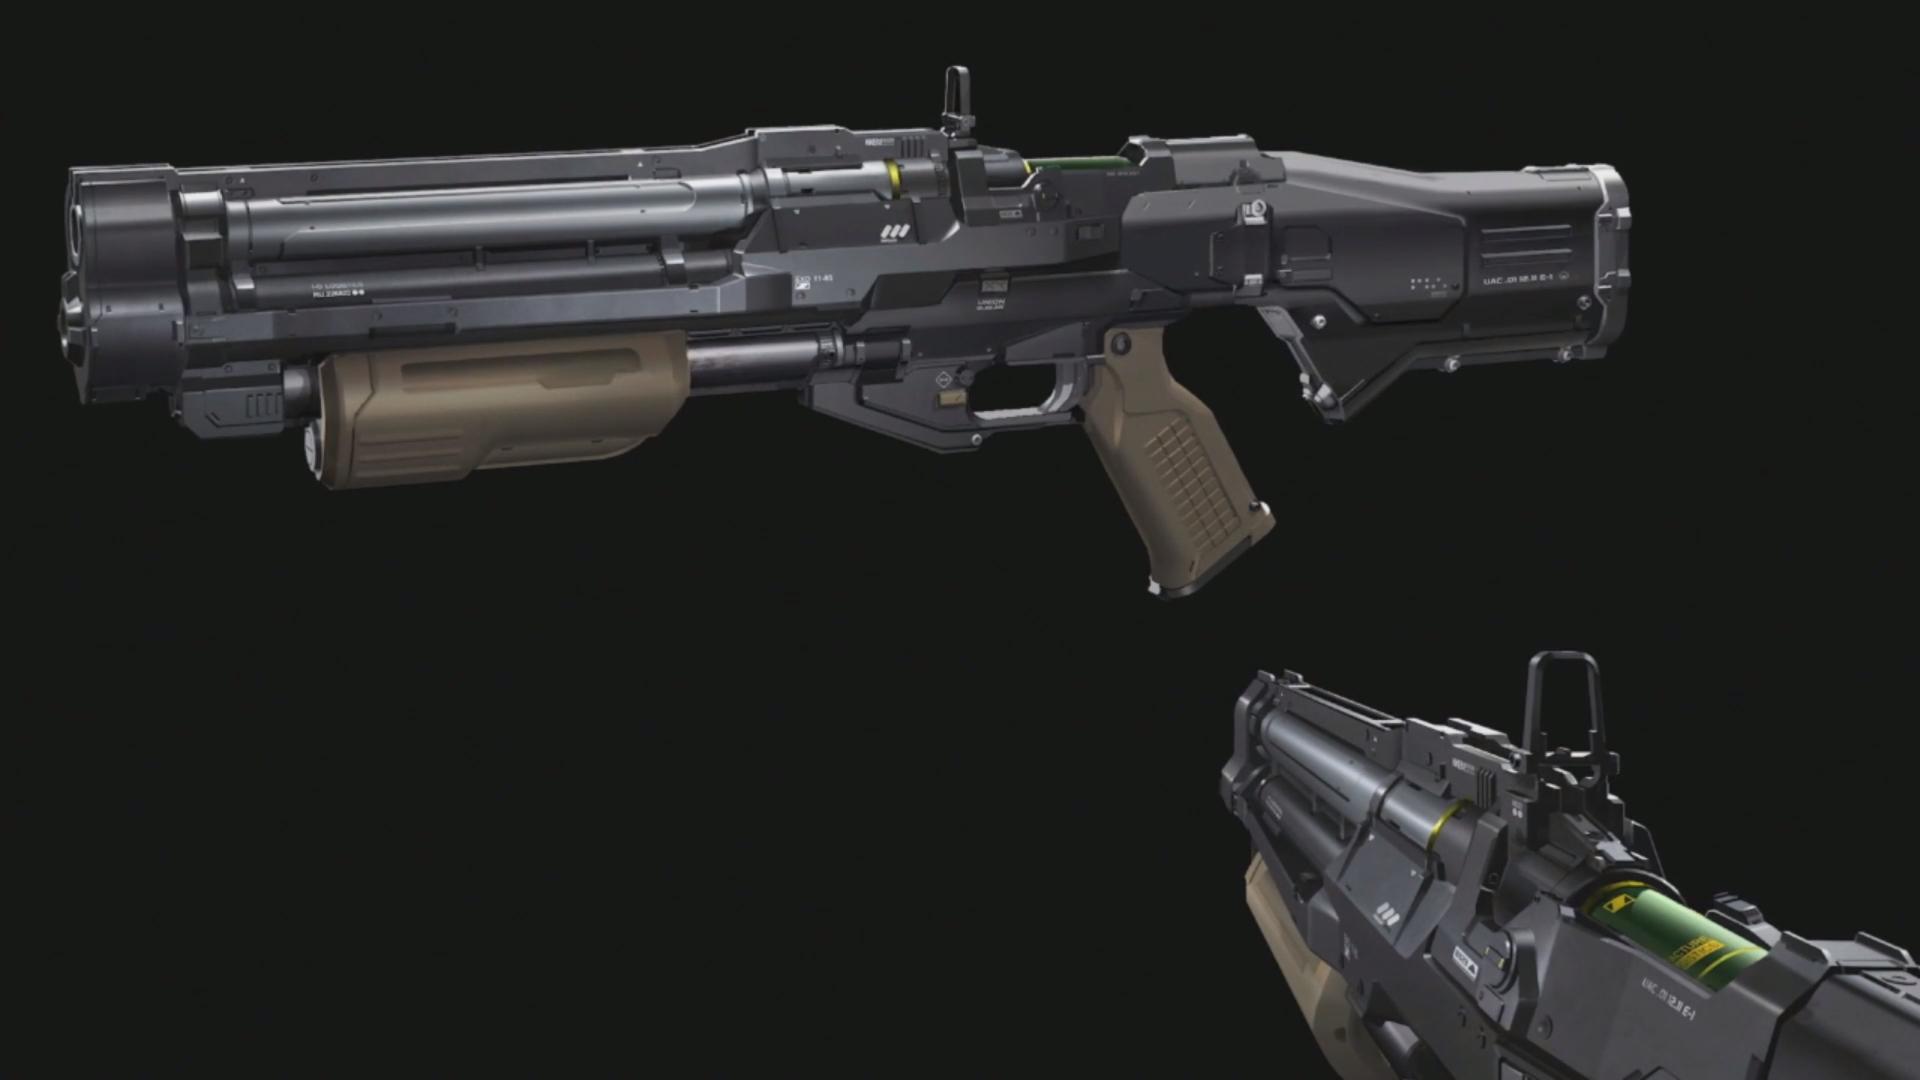 https://www.pcgamesn.com/wp-content/uploads/2018/08/Doom-Eternal-Combat-Shotgun.jpg